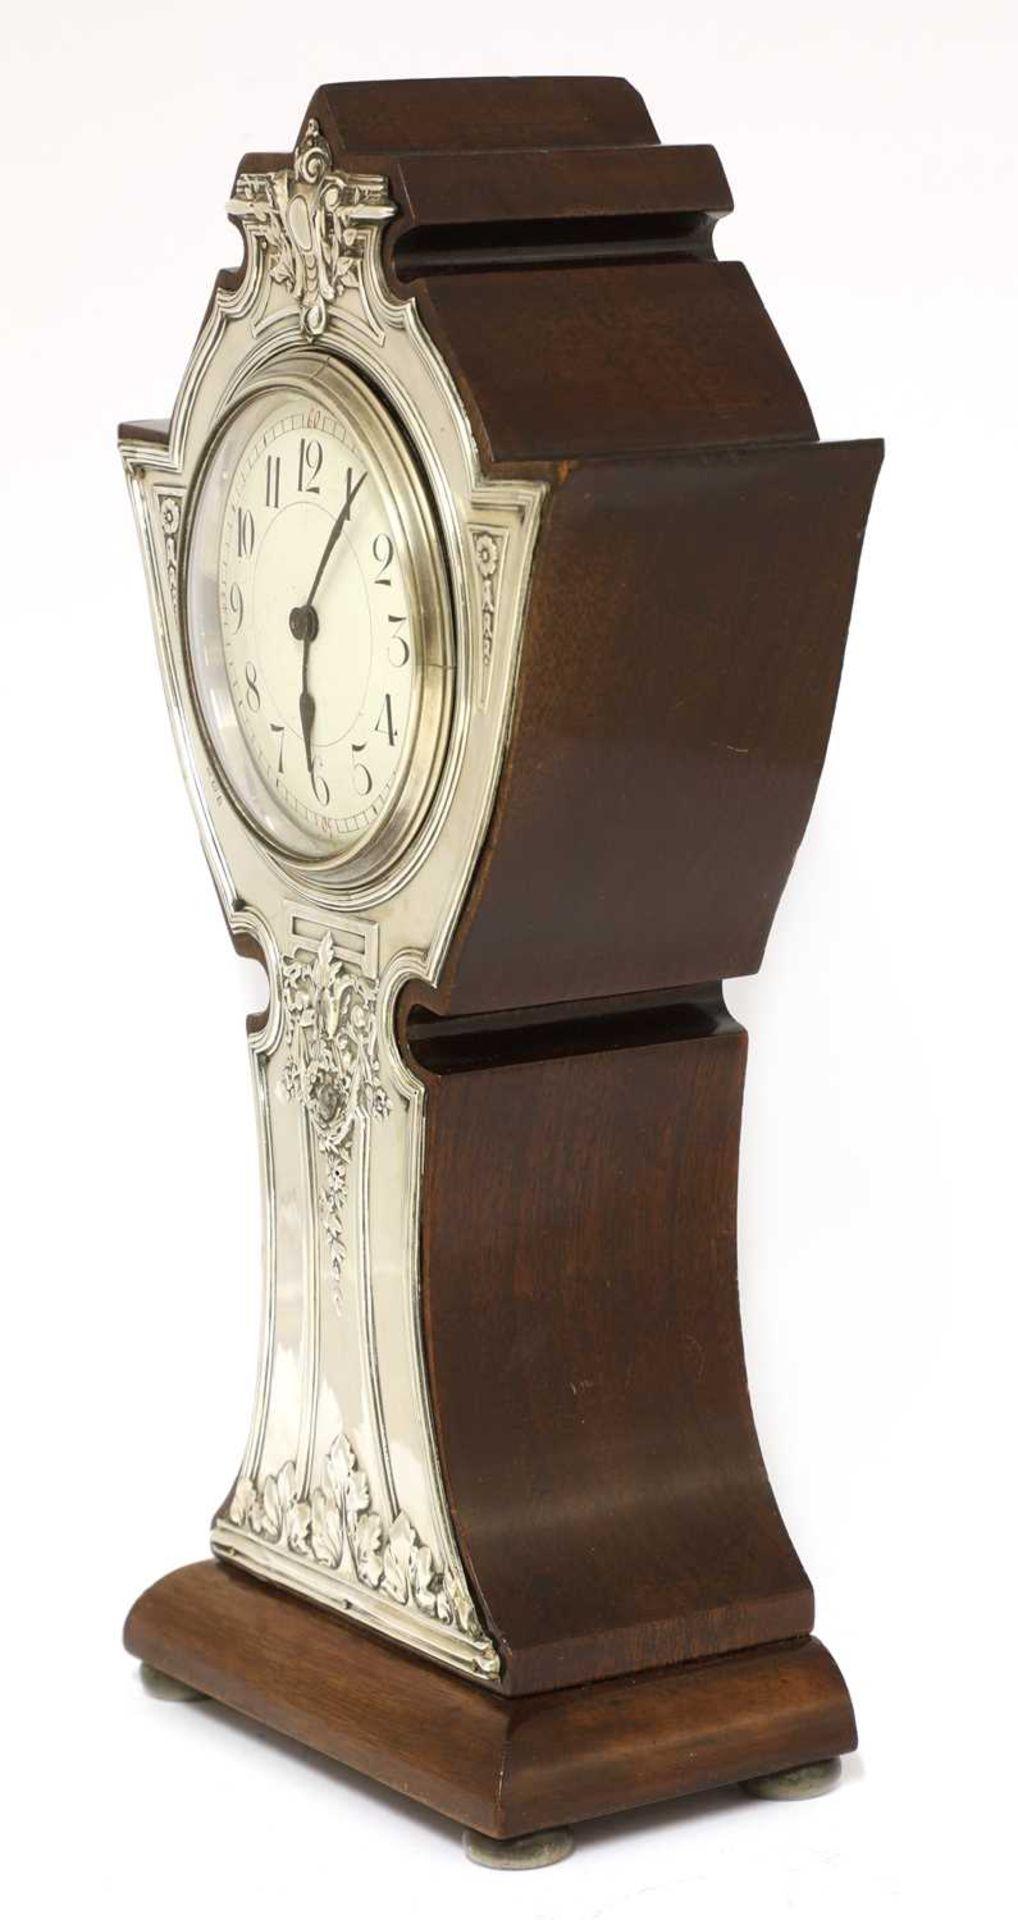 An Art Nouveau silver-mounted mantel clock, - Image 4 of 4